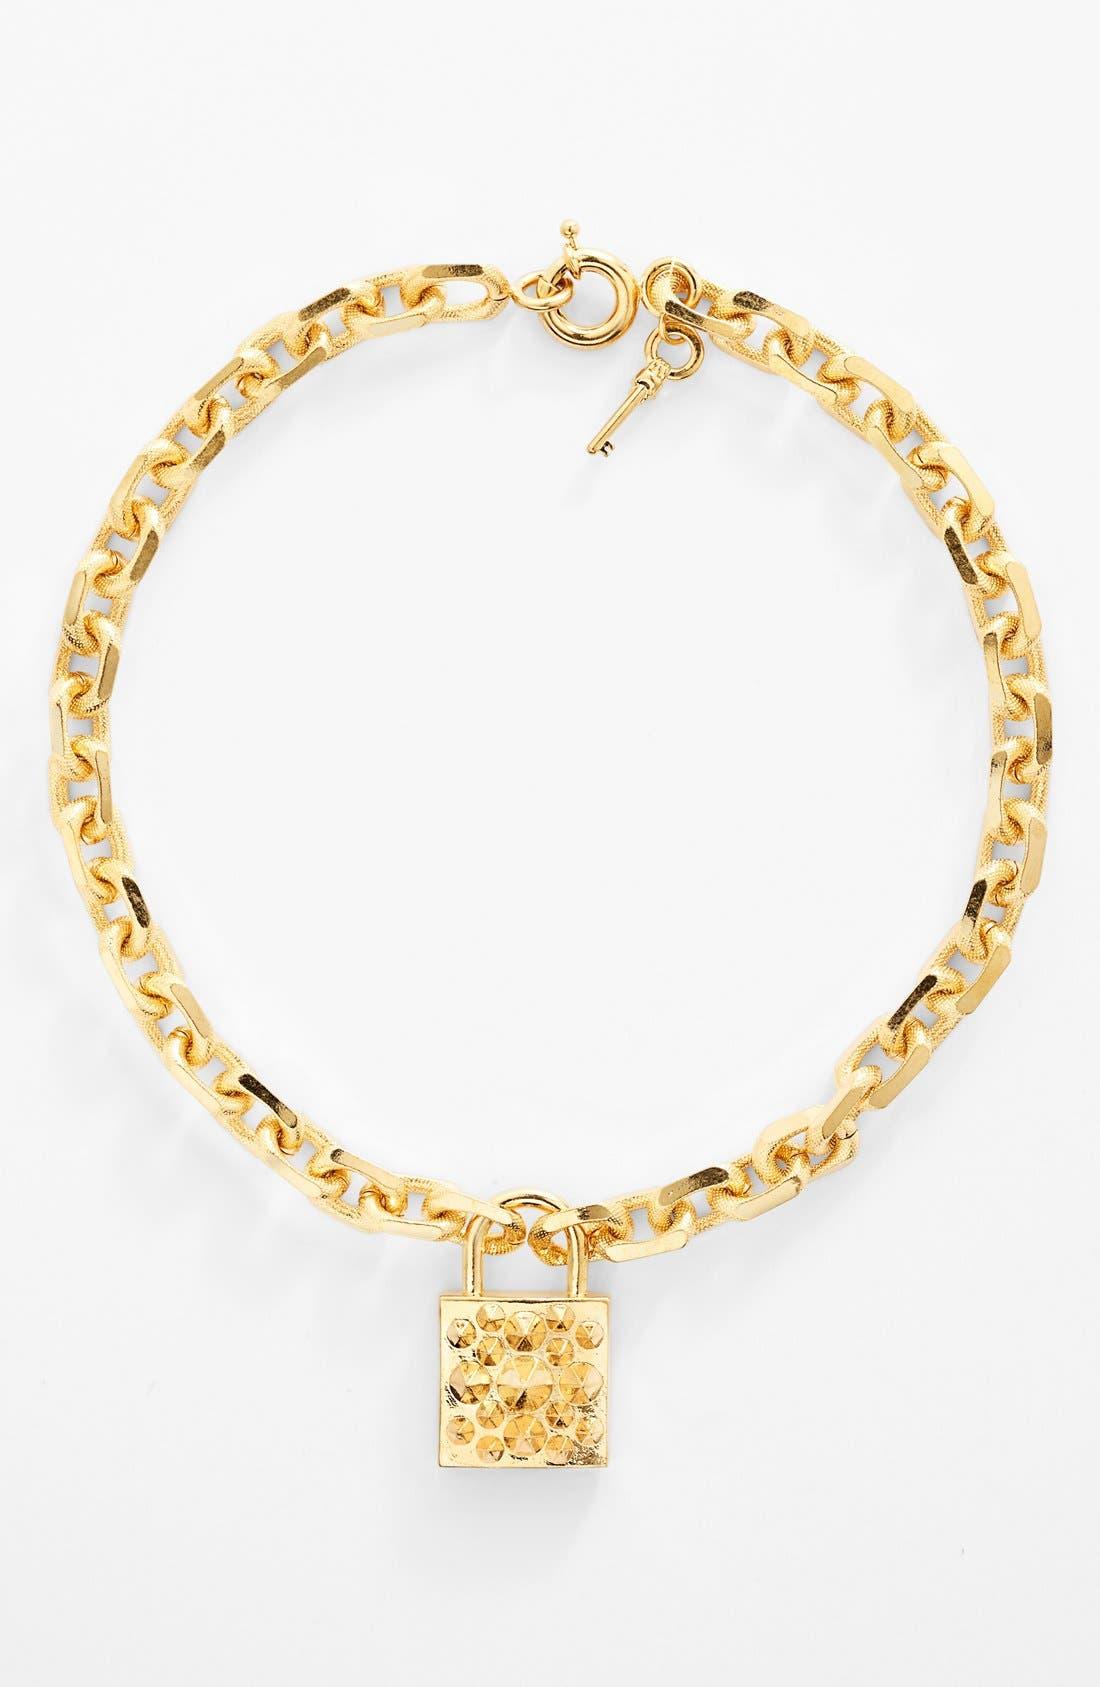 Alternate Image 1 Selected - Alexander McQueen Padlock & Key Chain Necklace